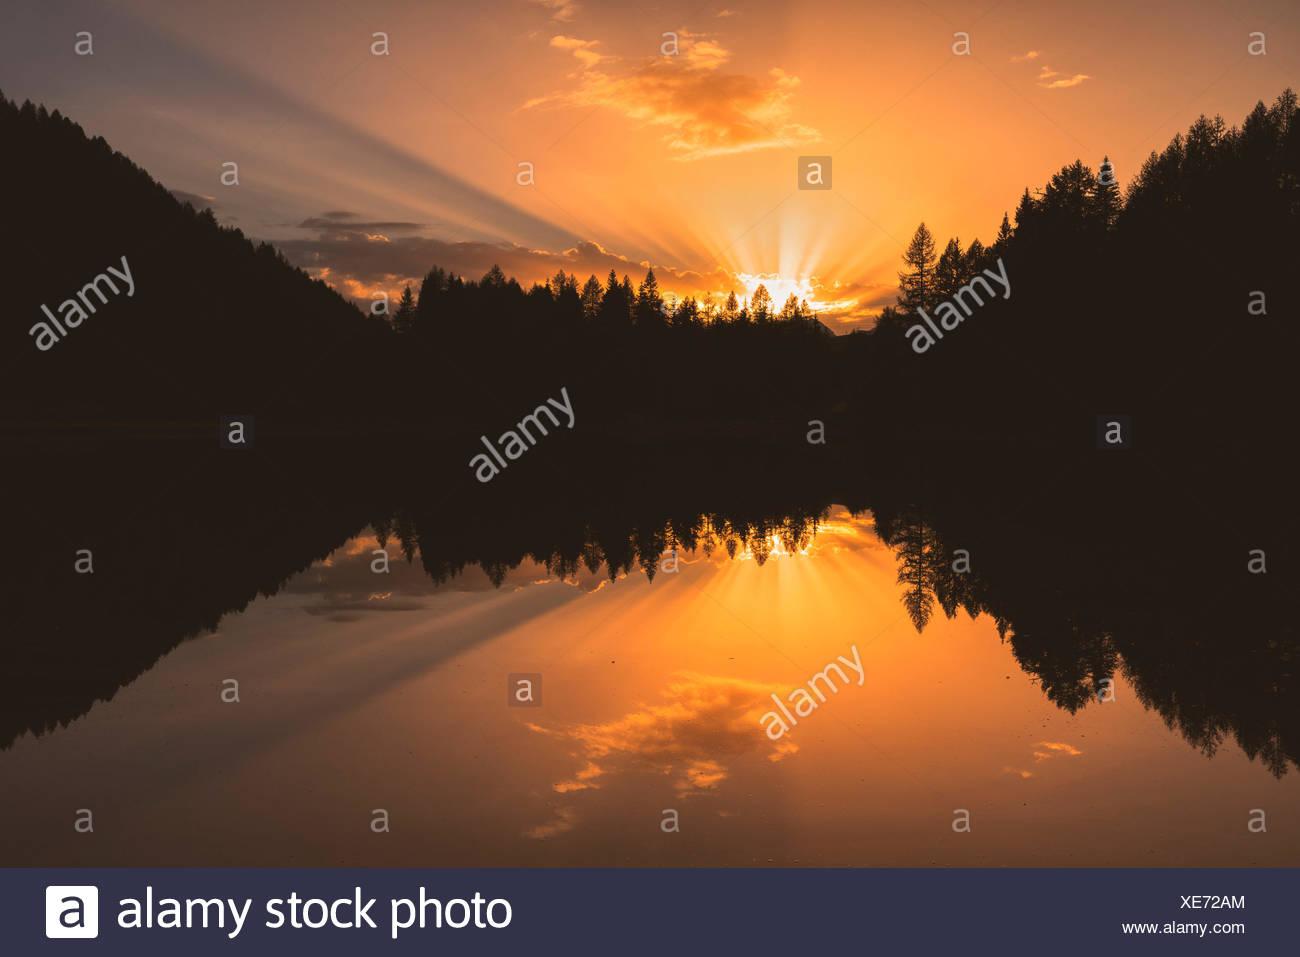 Europe, Italy, Trentino Alto Adige, Moena, Dolomites, the alpine lake of San Pellegrino. Stock Photo